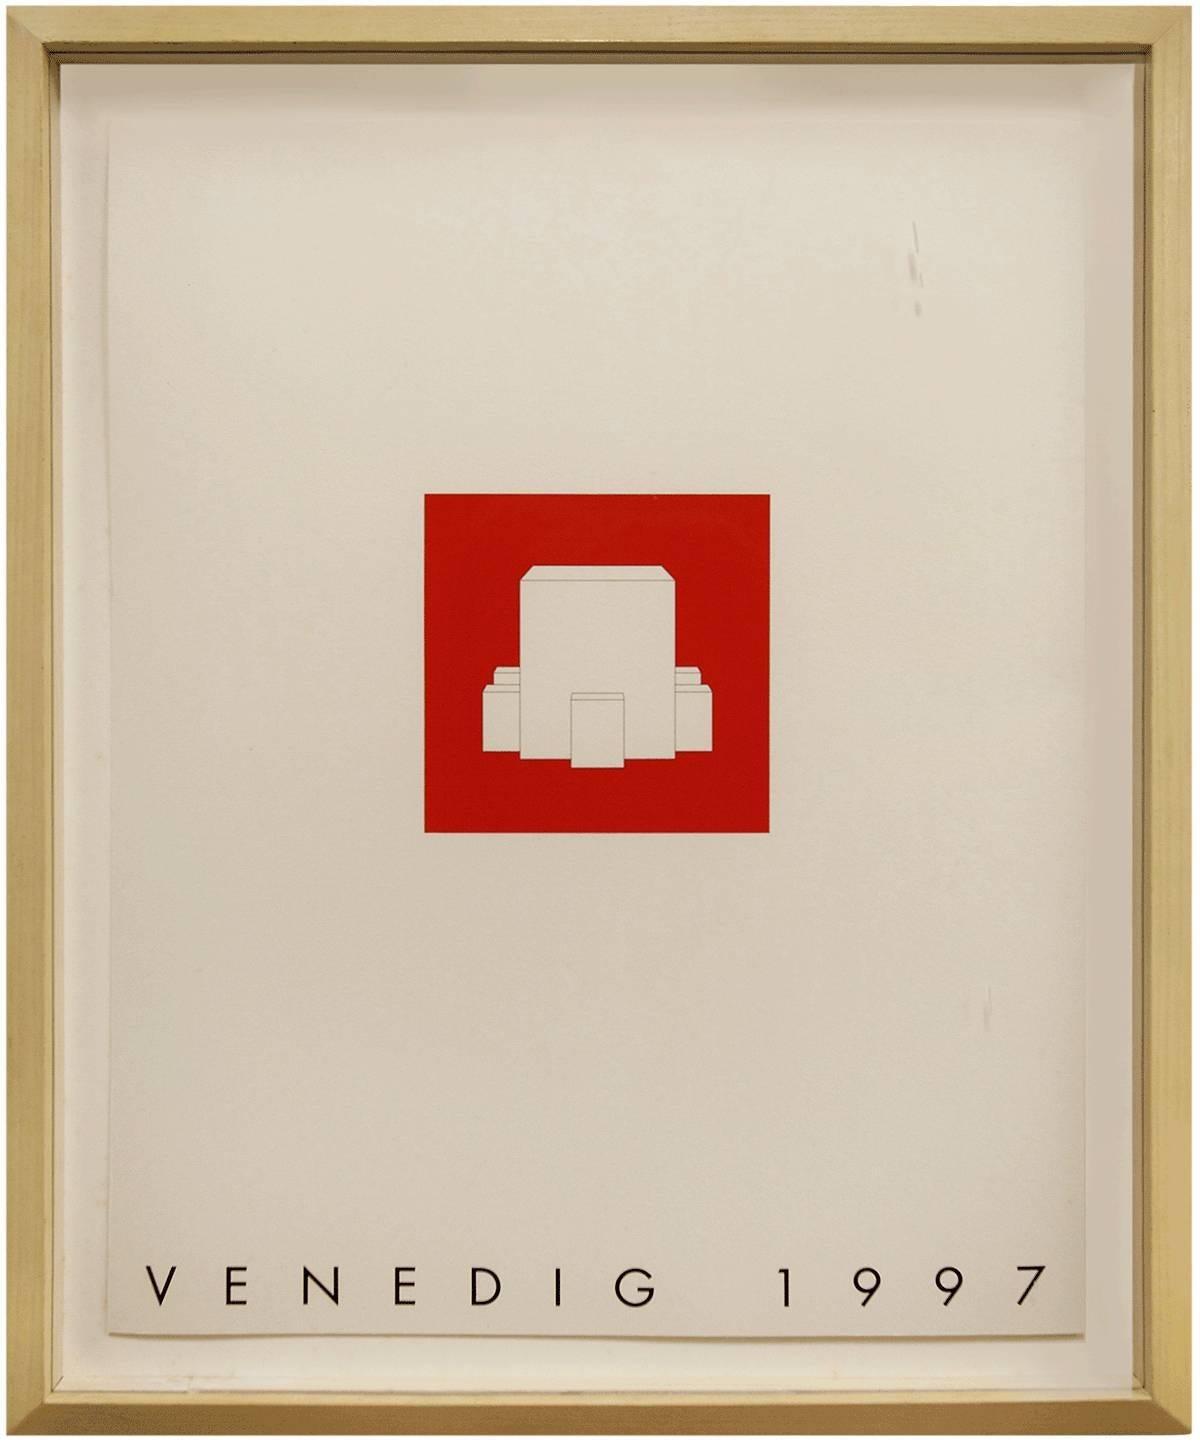 Venedig 1997 Minimalist Conceptual Architectural Silkscreen